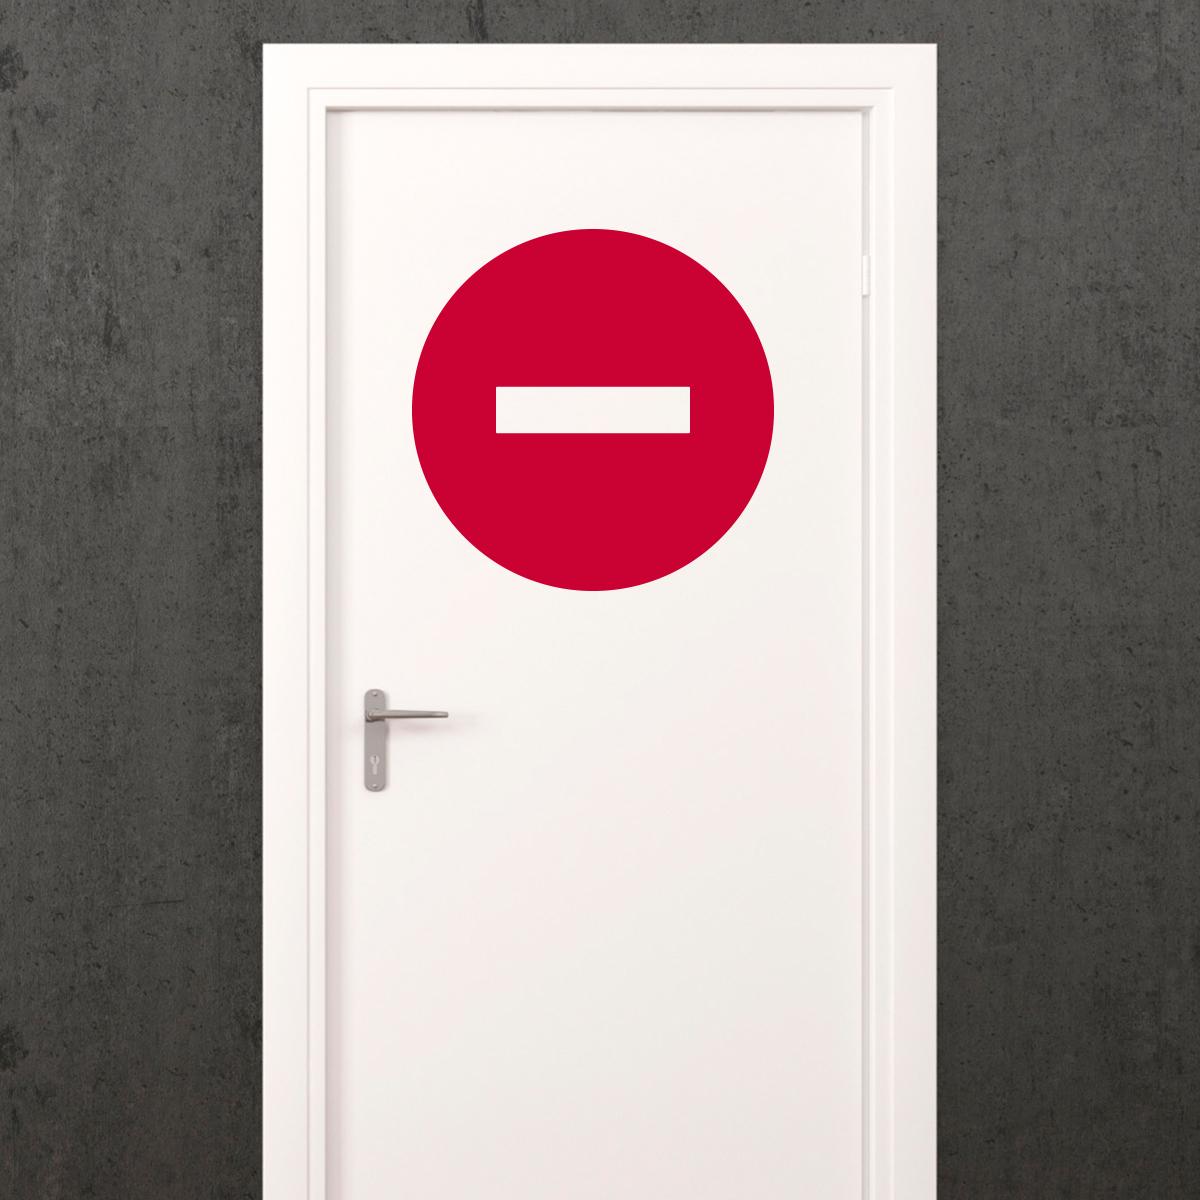 Sticker porte signal tique sens interdit stickers for Stickers pour chambre ado garcon